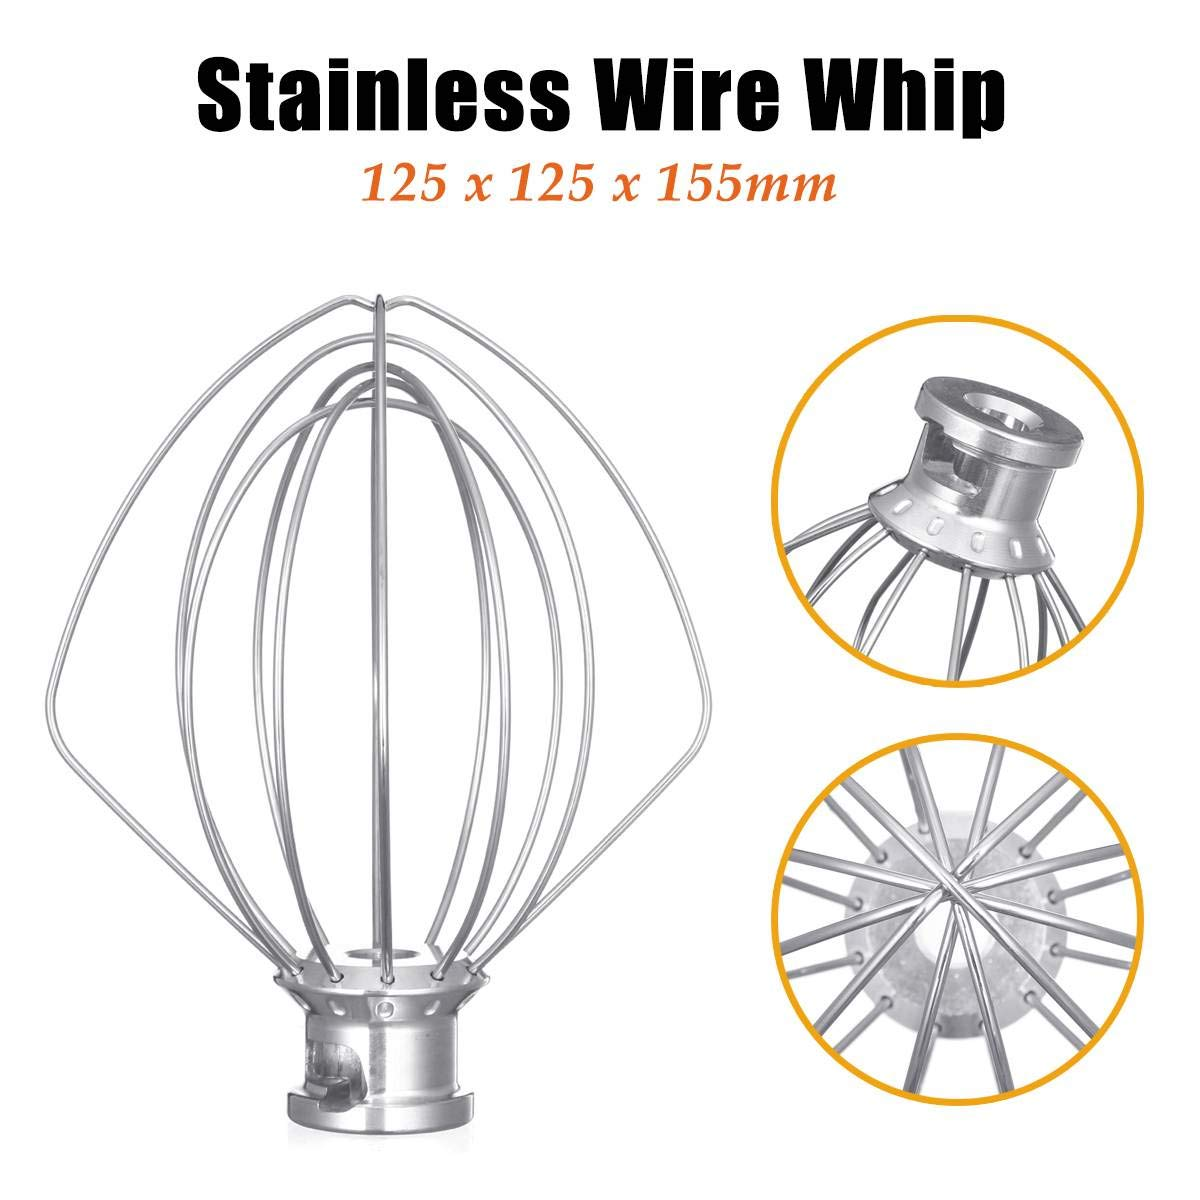 304 Stainless Steel Wire Whip Mixer Attachment For KitchenAid K45WW 9704329 Egg Cream Stirrer Flour Cake Balloon Whisk